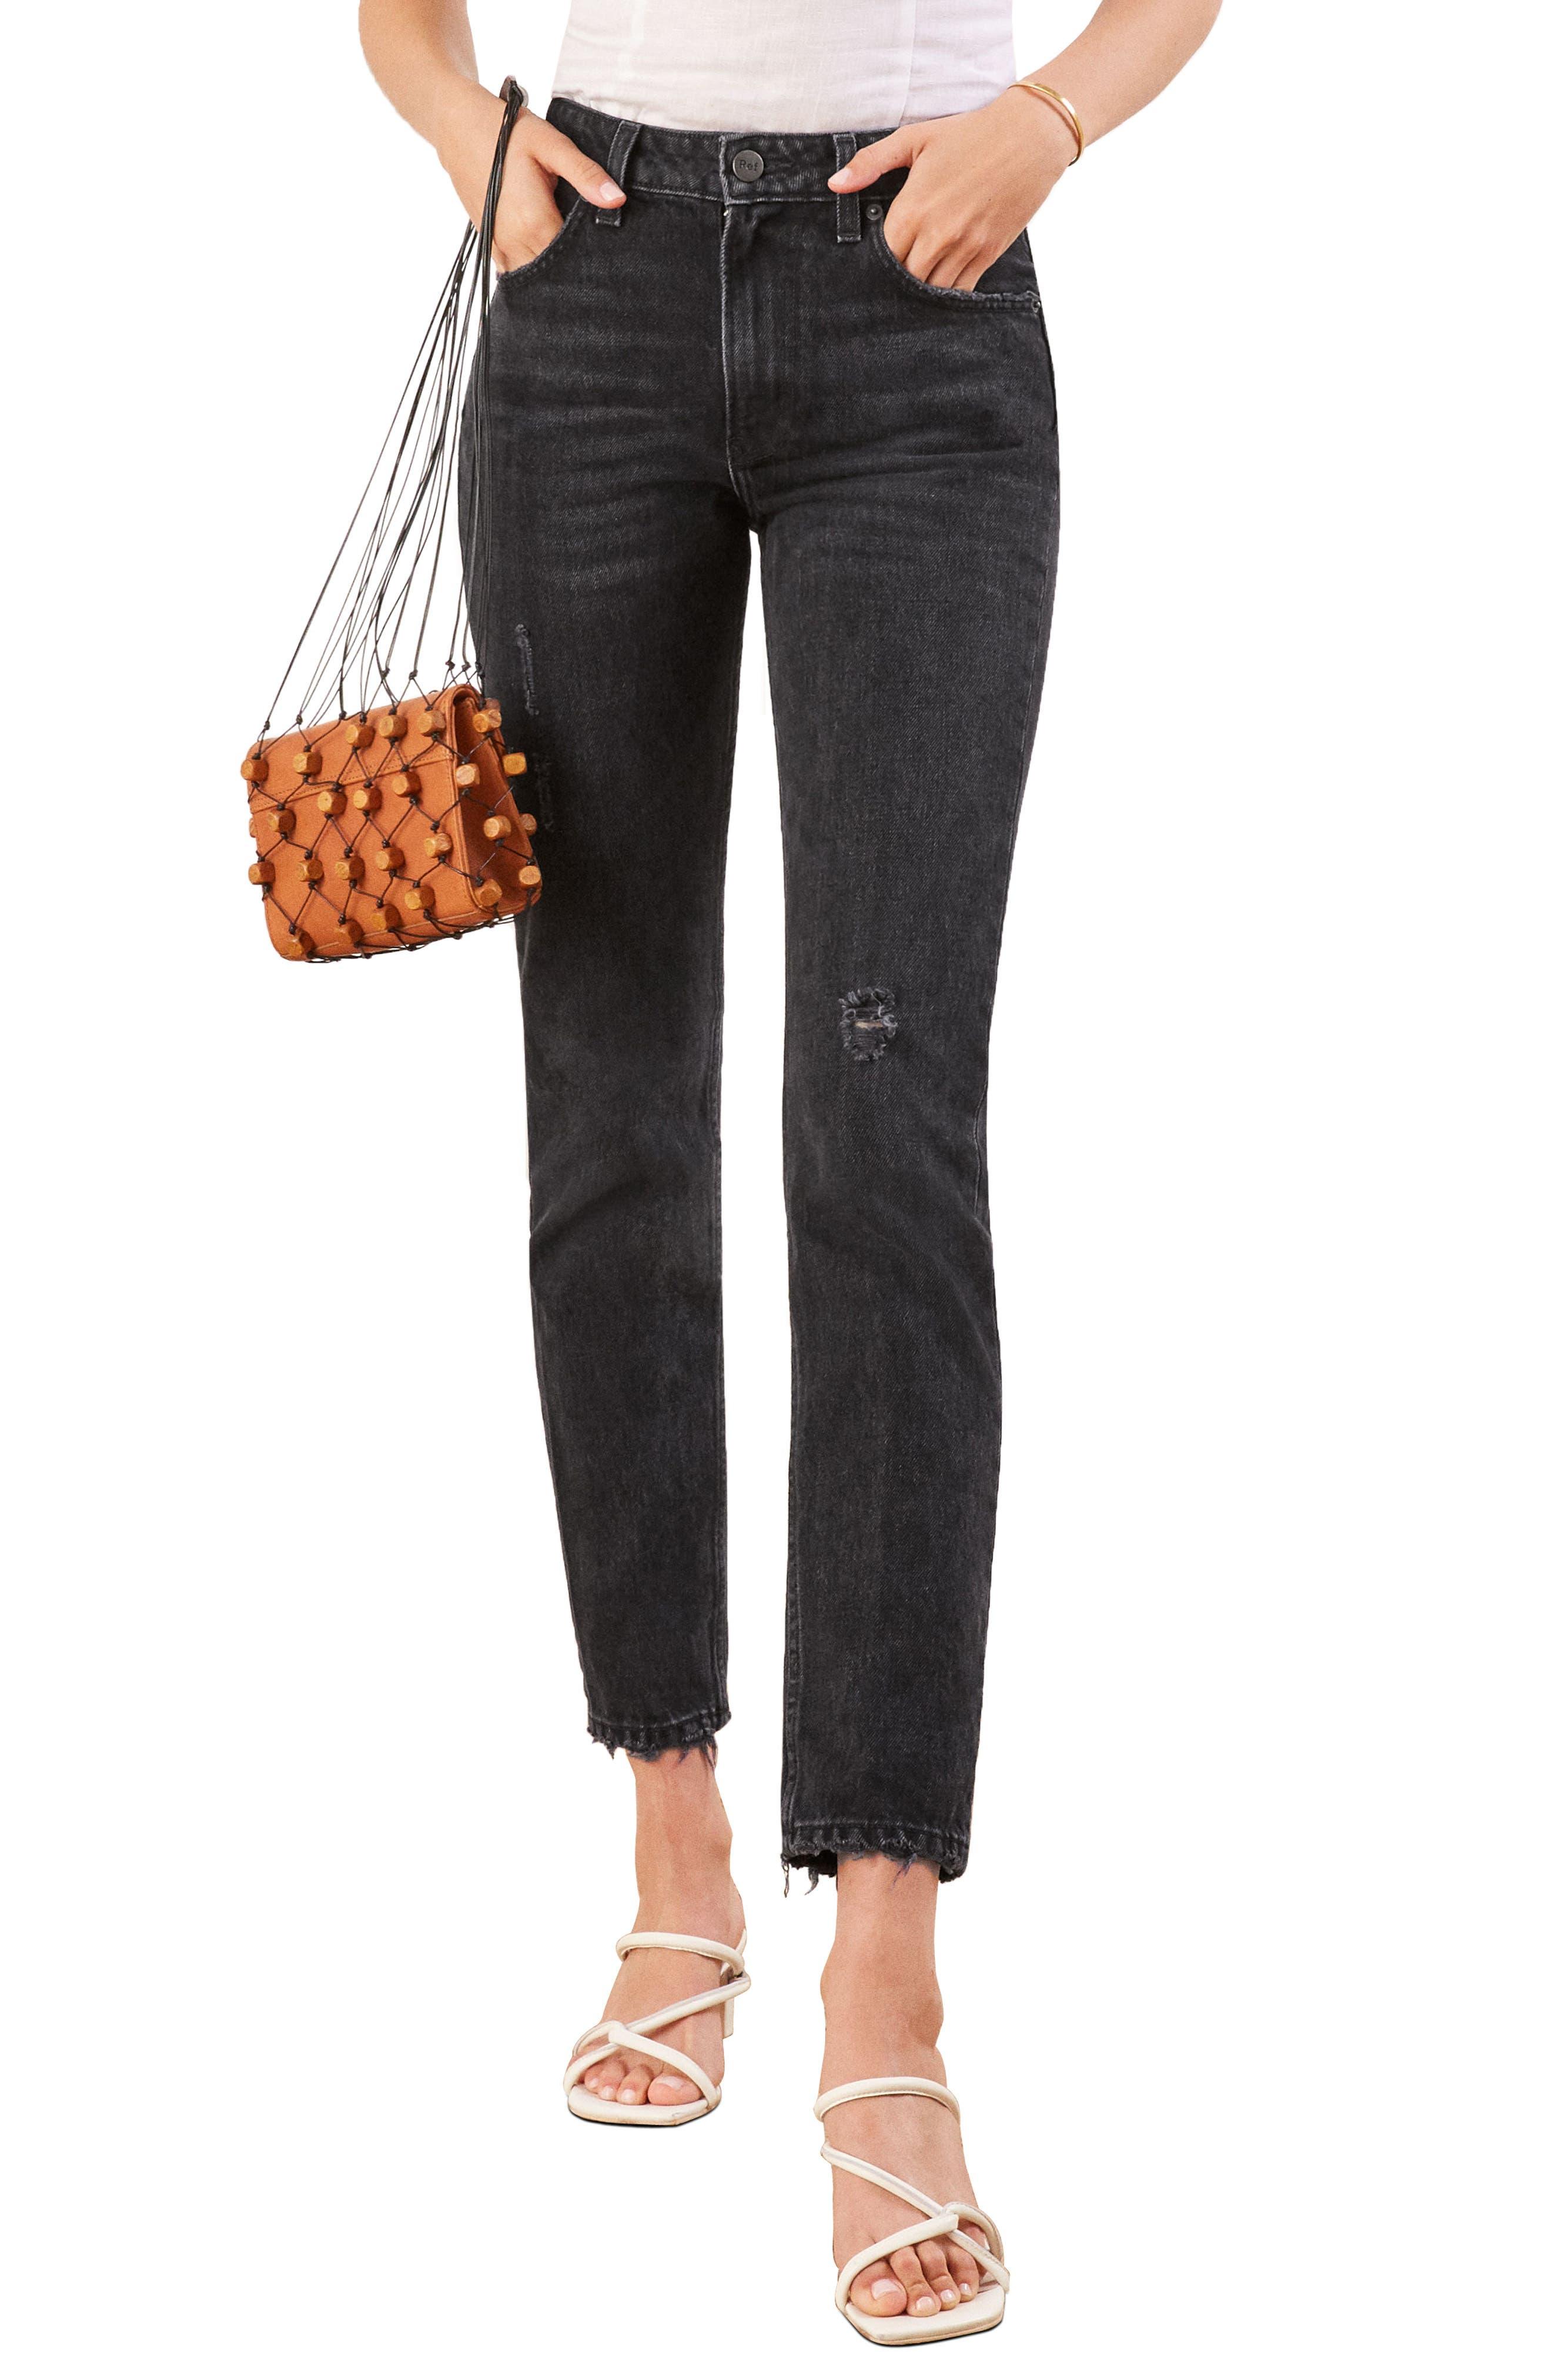 REFORMATION Julia High Waist Cigarette Jeans, Main, color, BLACK